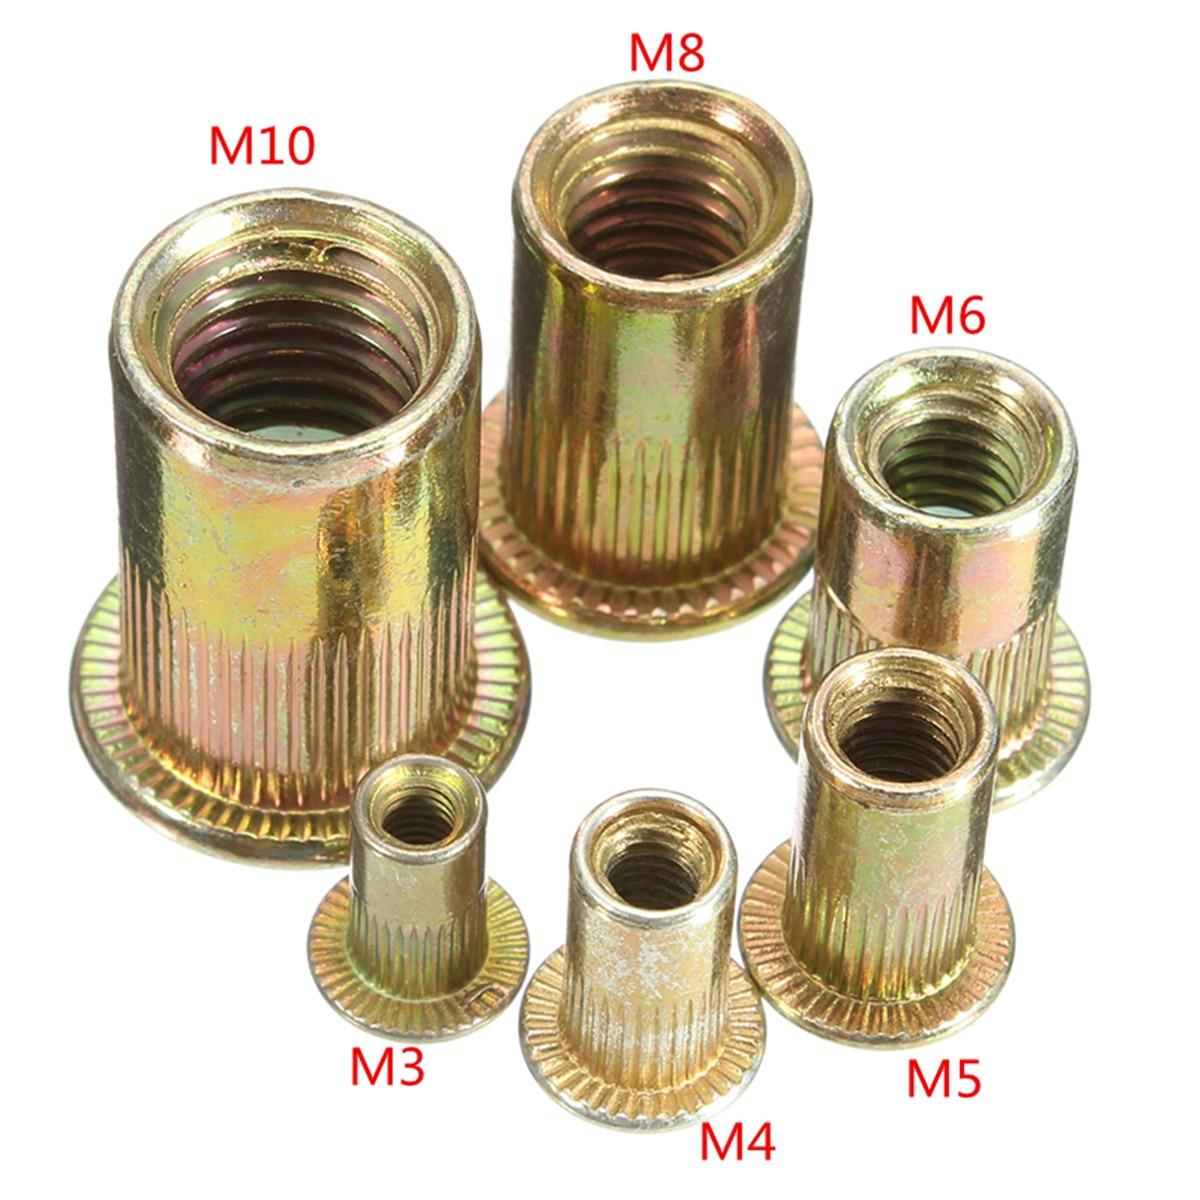 10/20PCS/set M3 M4 M6 M8 M10 Flat Head Carbon Steel Rivet Nuts  Rivet Nuts Set Nuts Insert Riveting